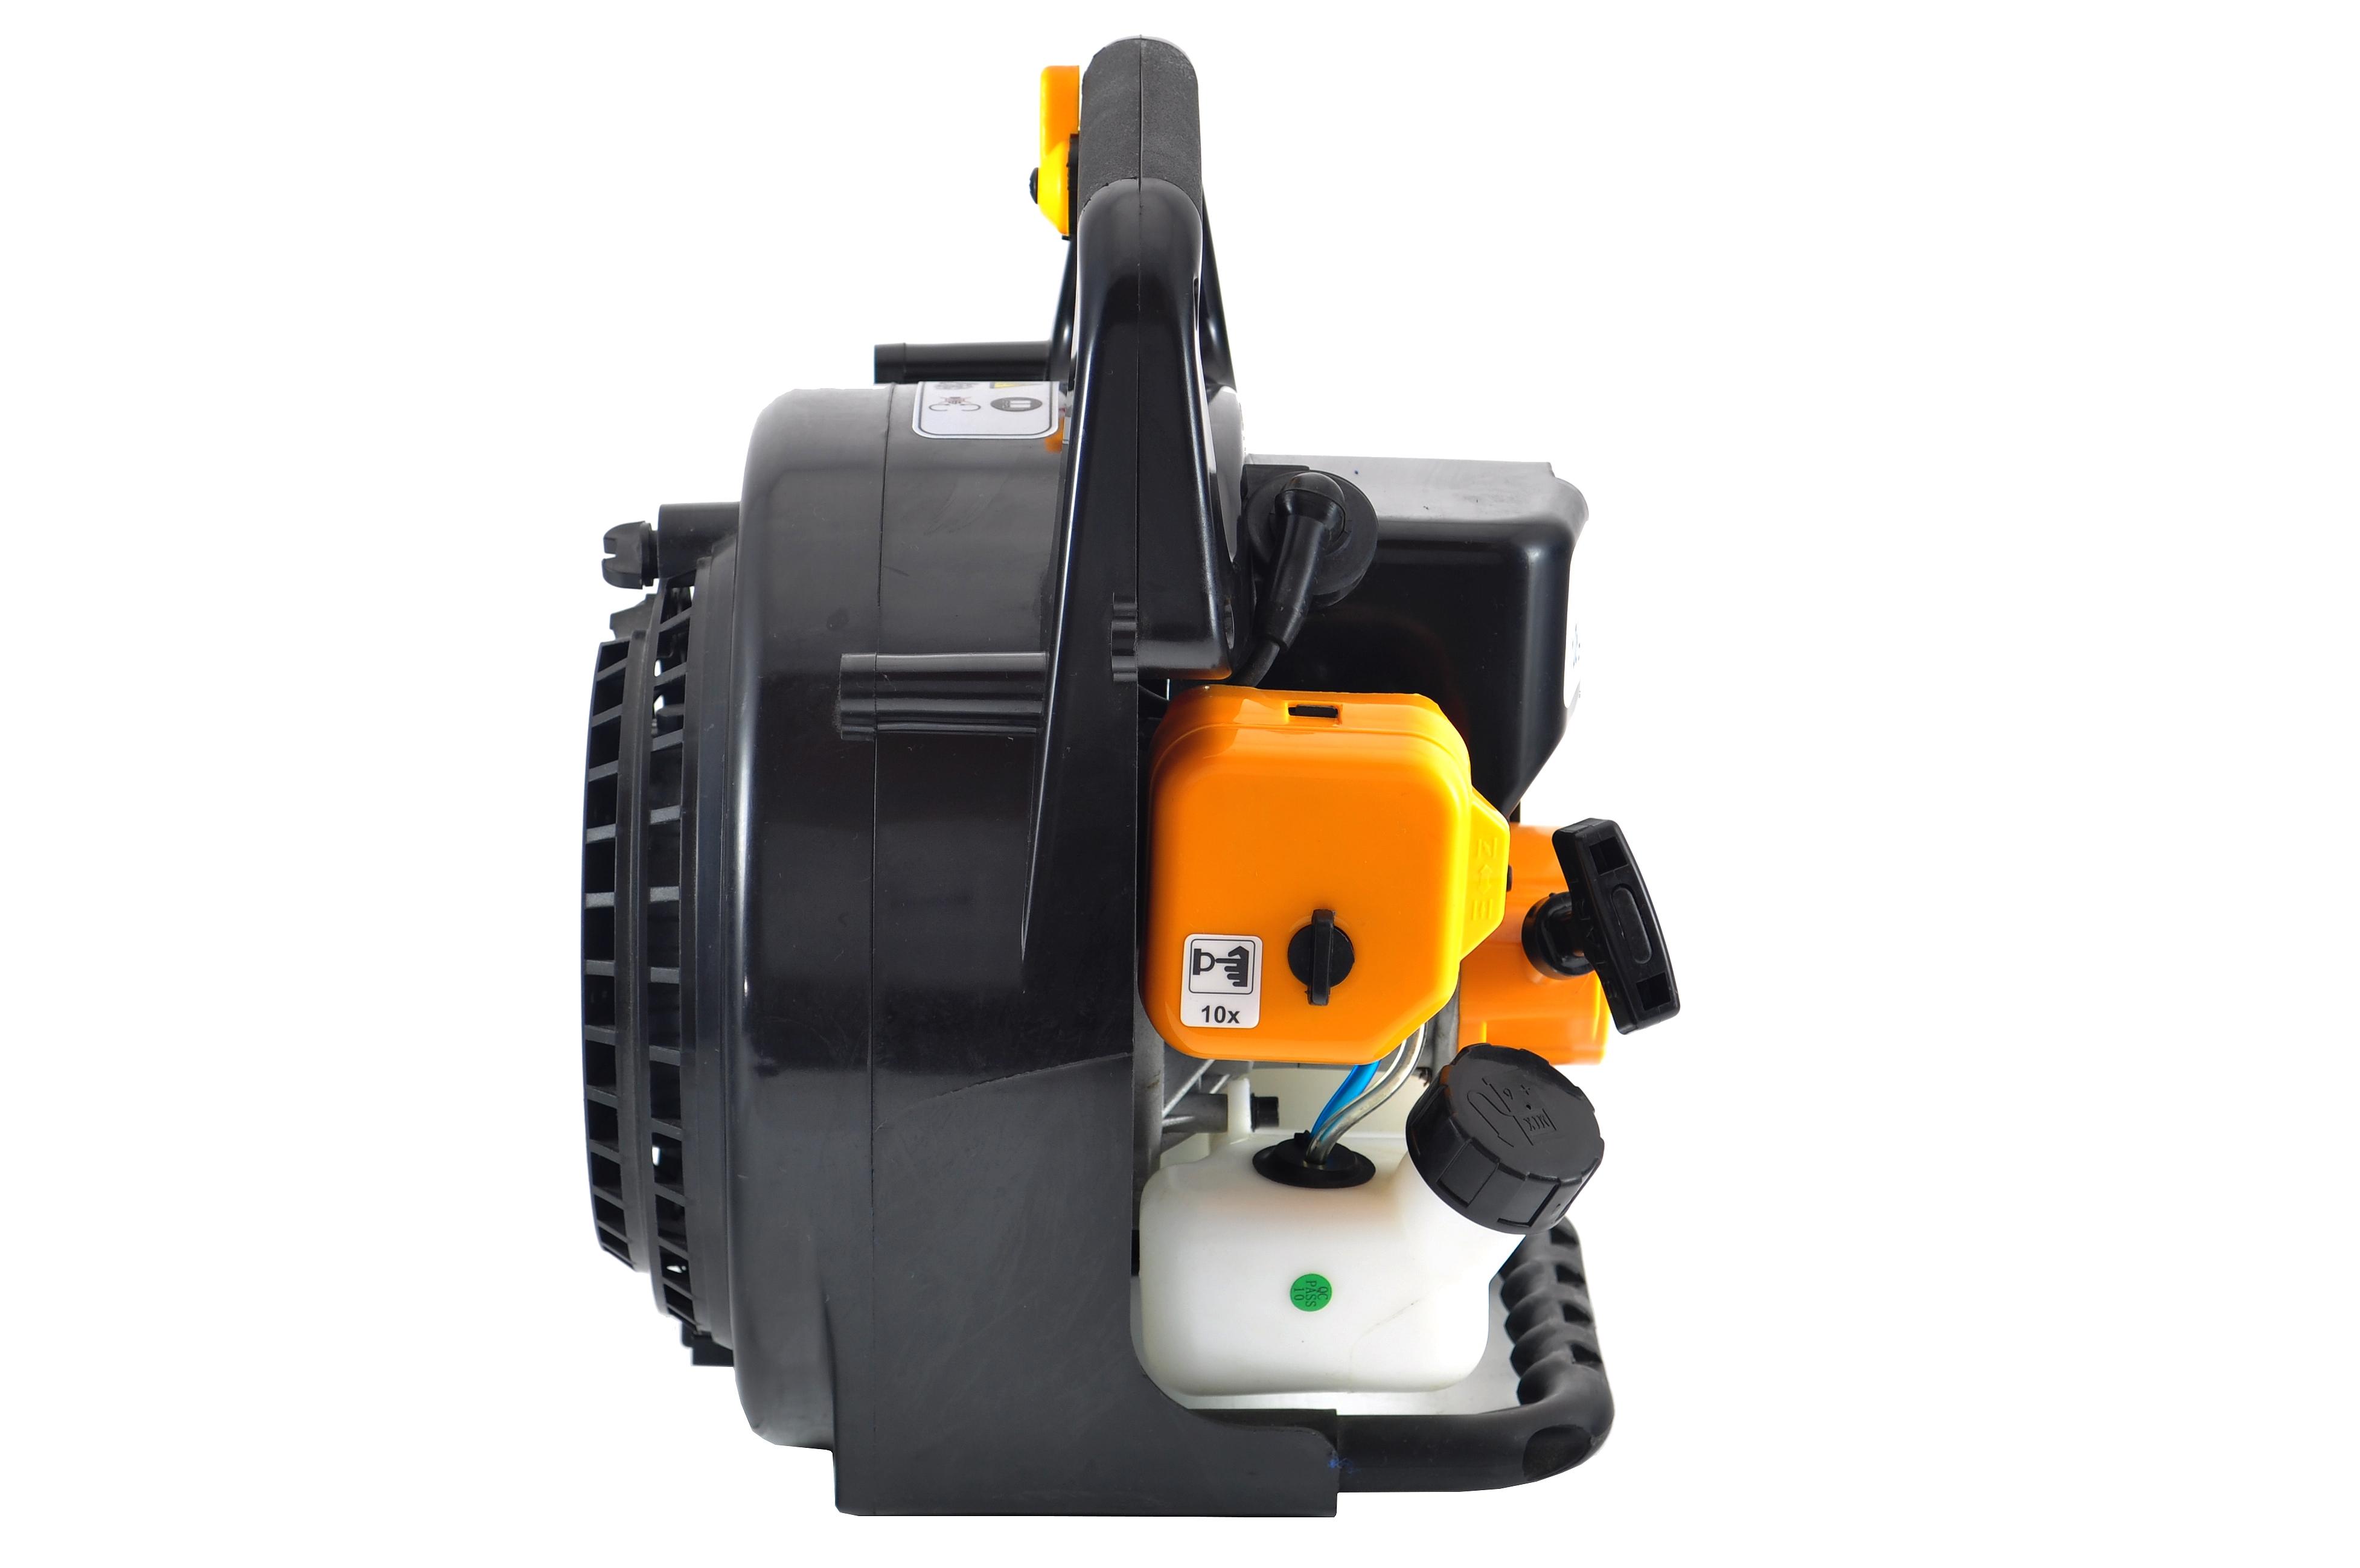 Sopro-Aspirador a Gasolina - GBV26